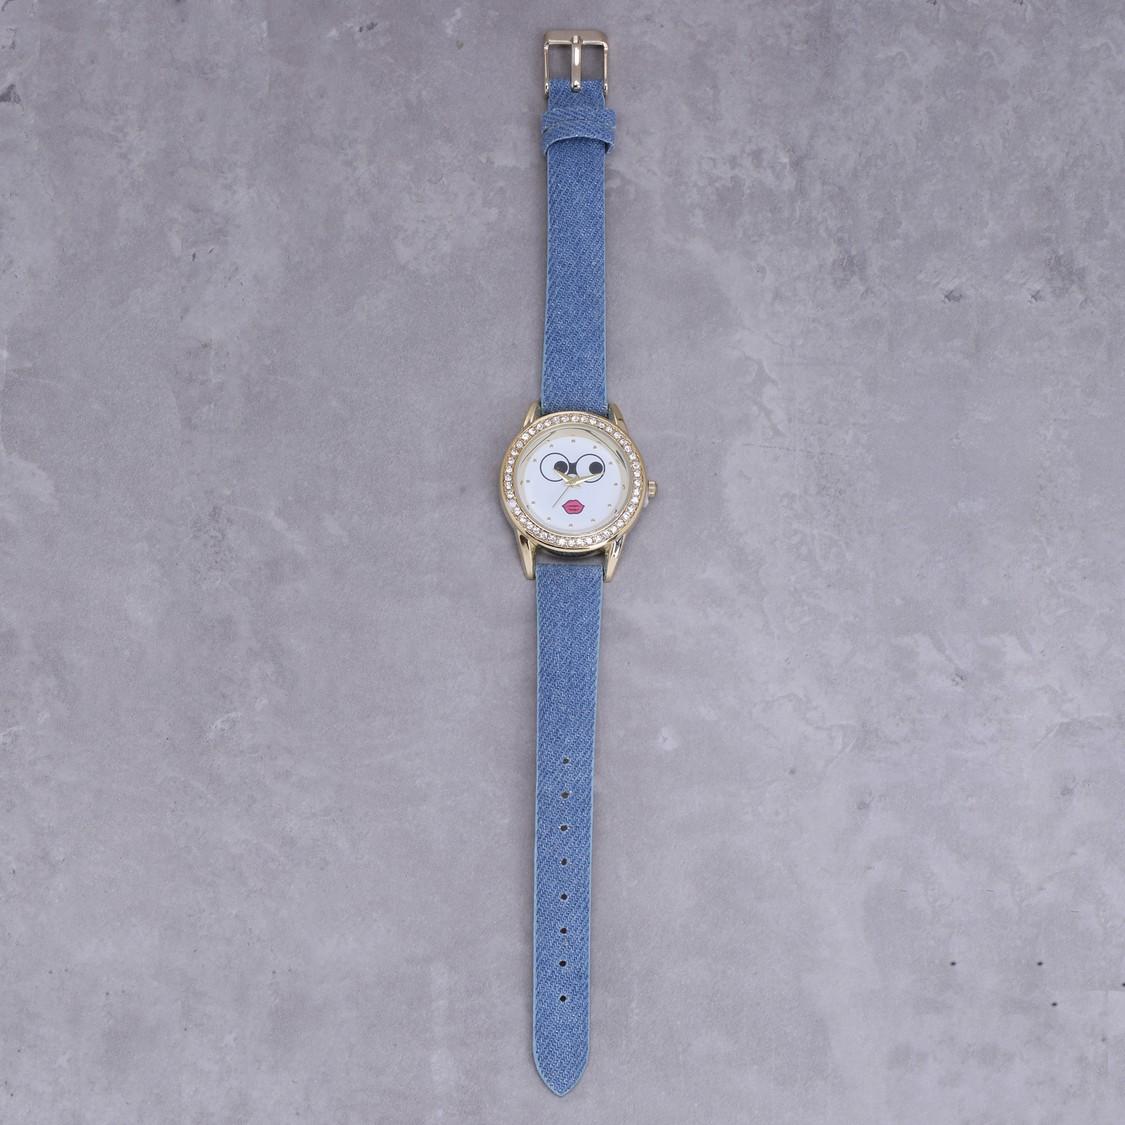 Embellished Wrist Watch